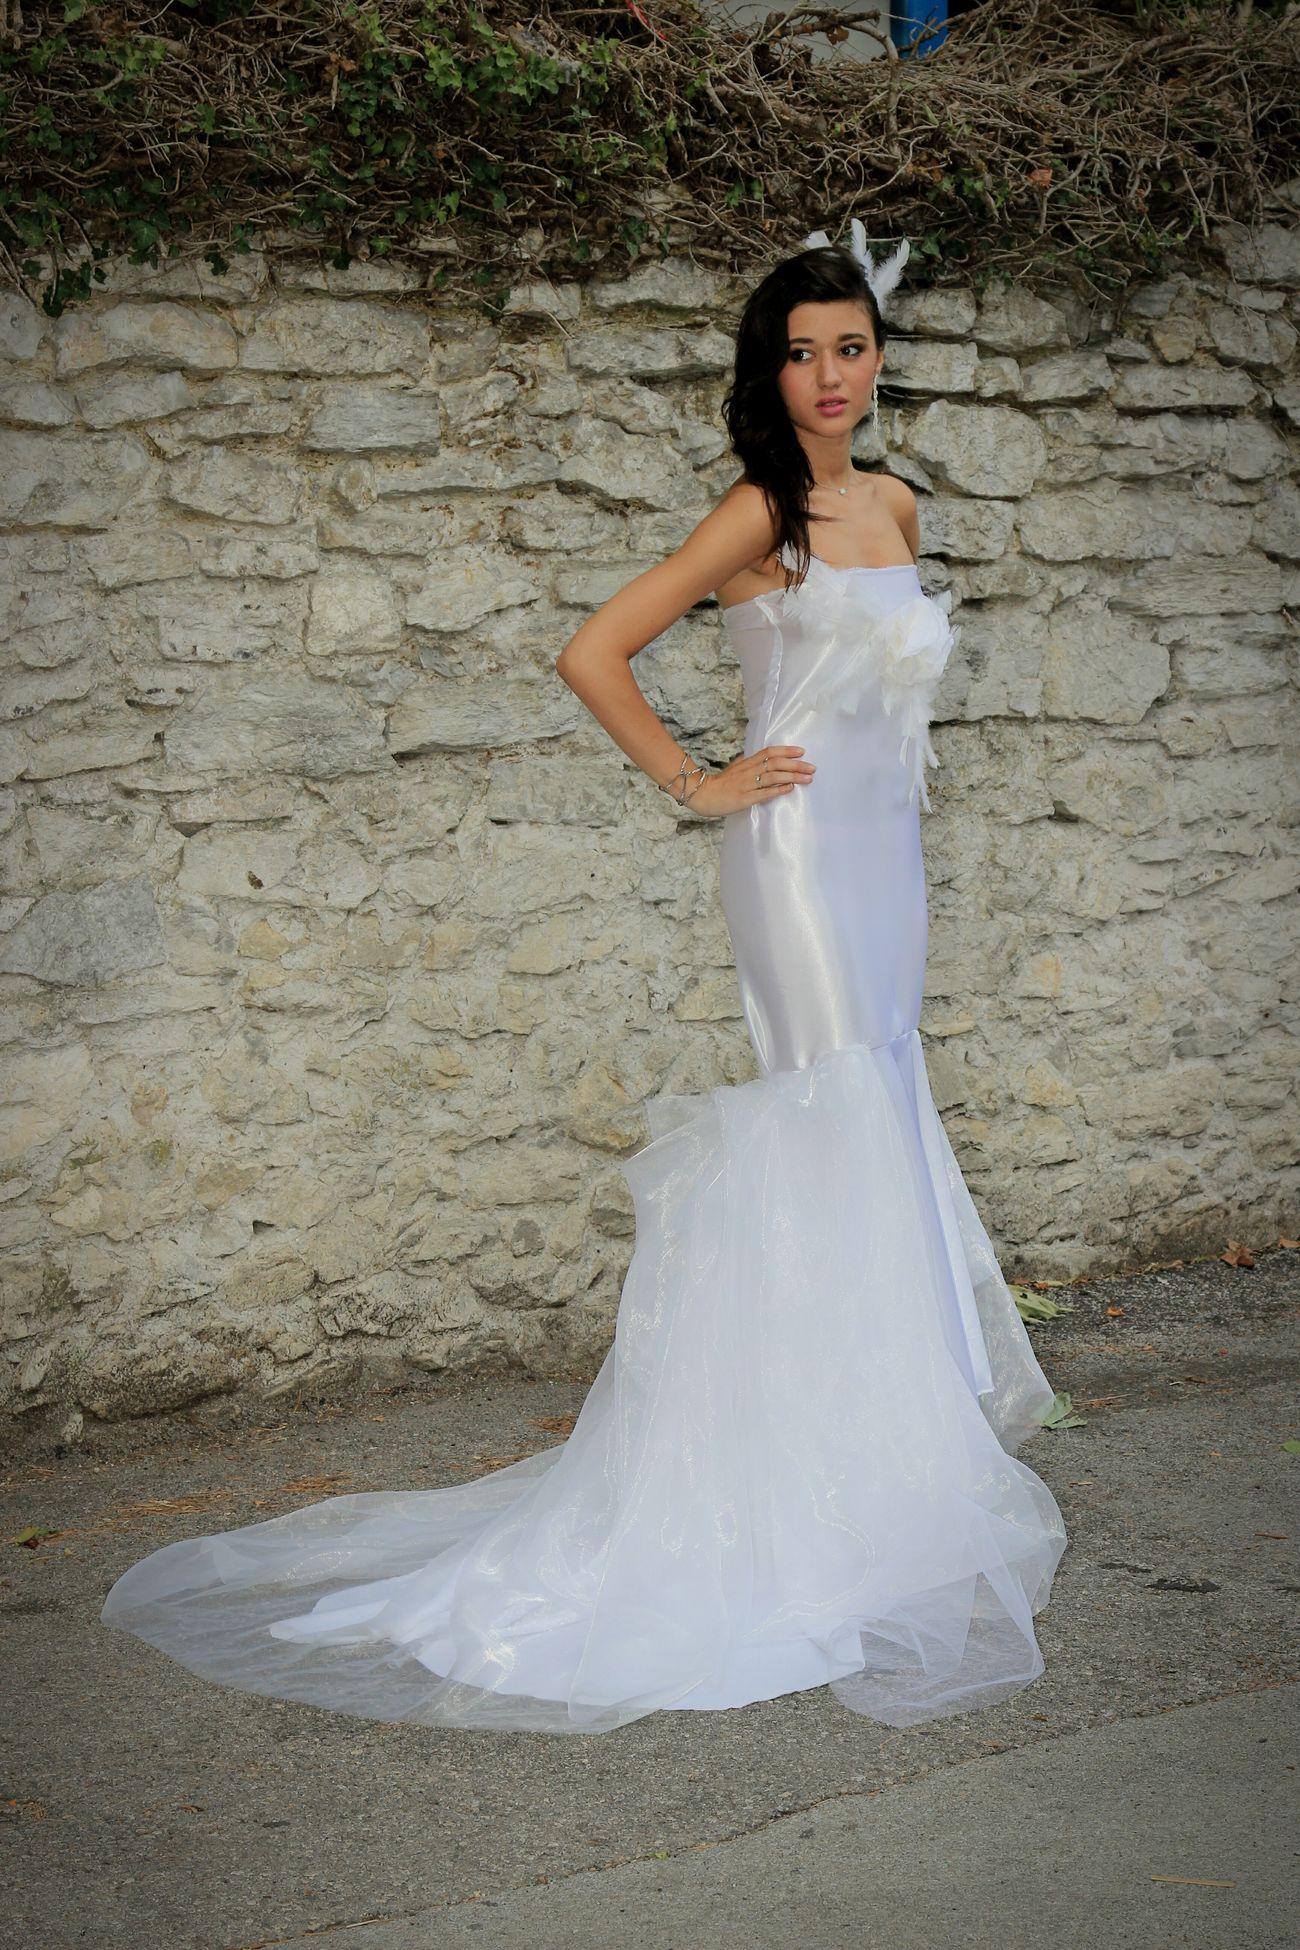 Pure... 🌹 Modèle Fashiondress Dress Mode Silhouette Estivencreation Ice Princesses Nouvellecollection Wedding Photography Weddingdress